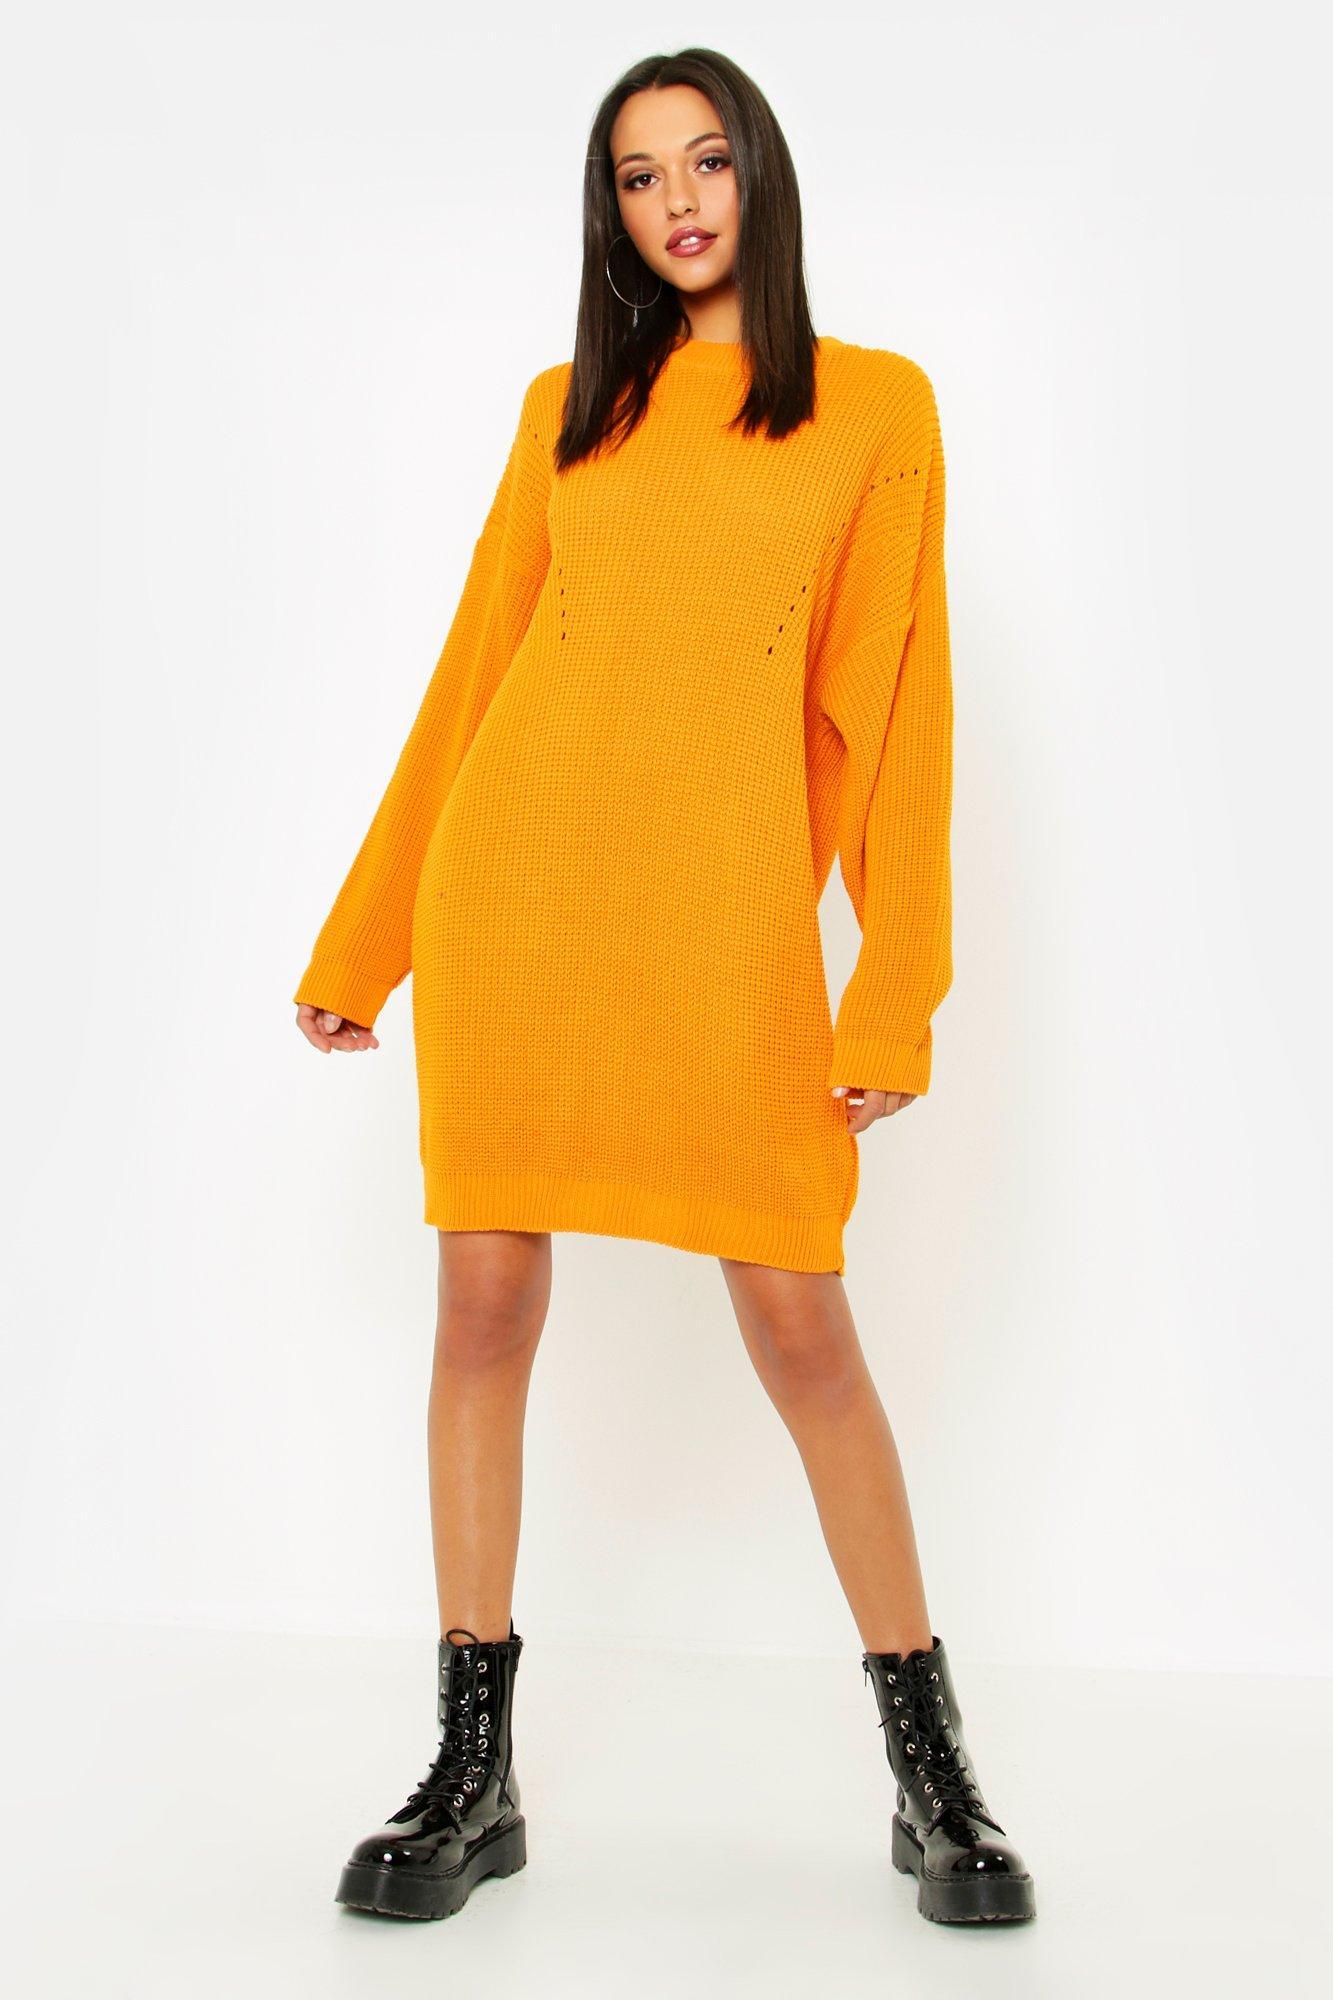 Womens Tall roll/polo neck Jumper Dress - gold - S/M, Gold - Boohoo.com